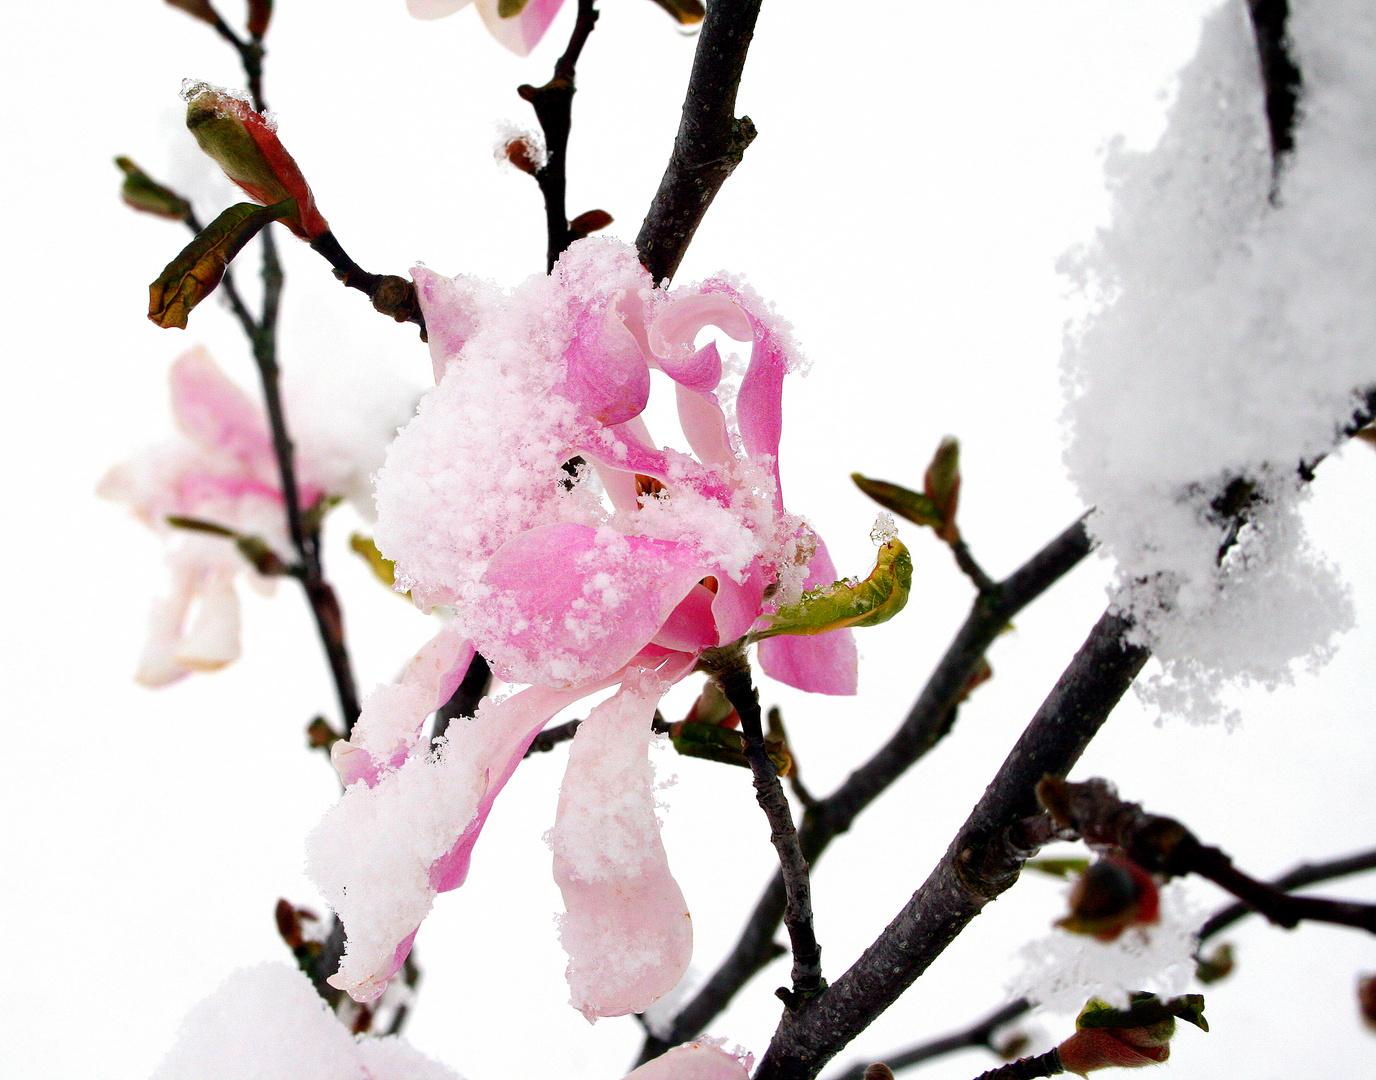 magnolie im schnee foto bild pflanzen pilze flechten bl ten kleinpflanzen. Black Bedroom Furniture Sets. Home Design Ideas